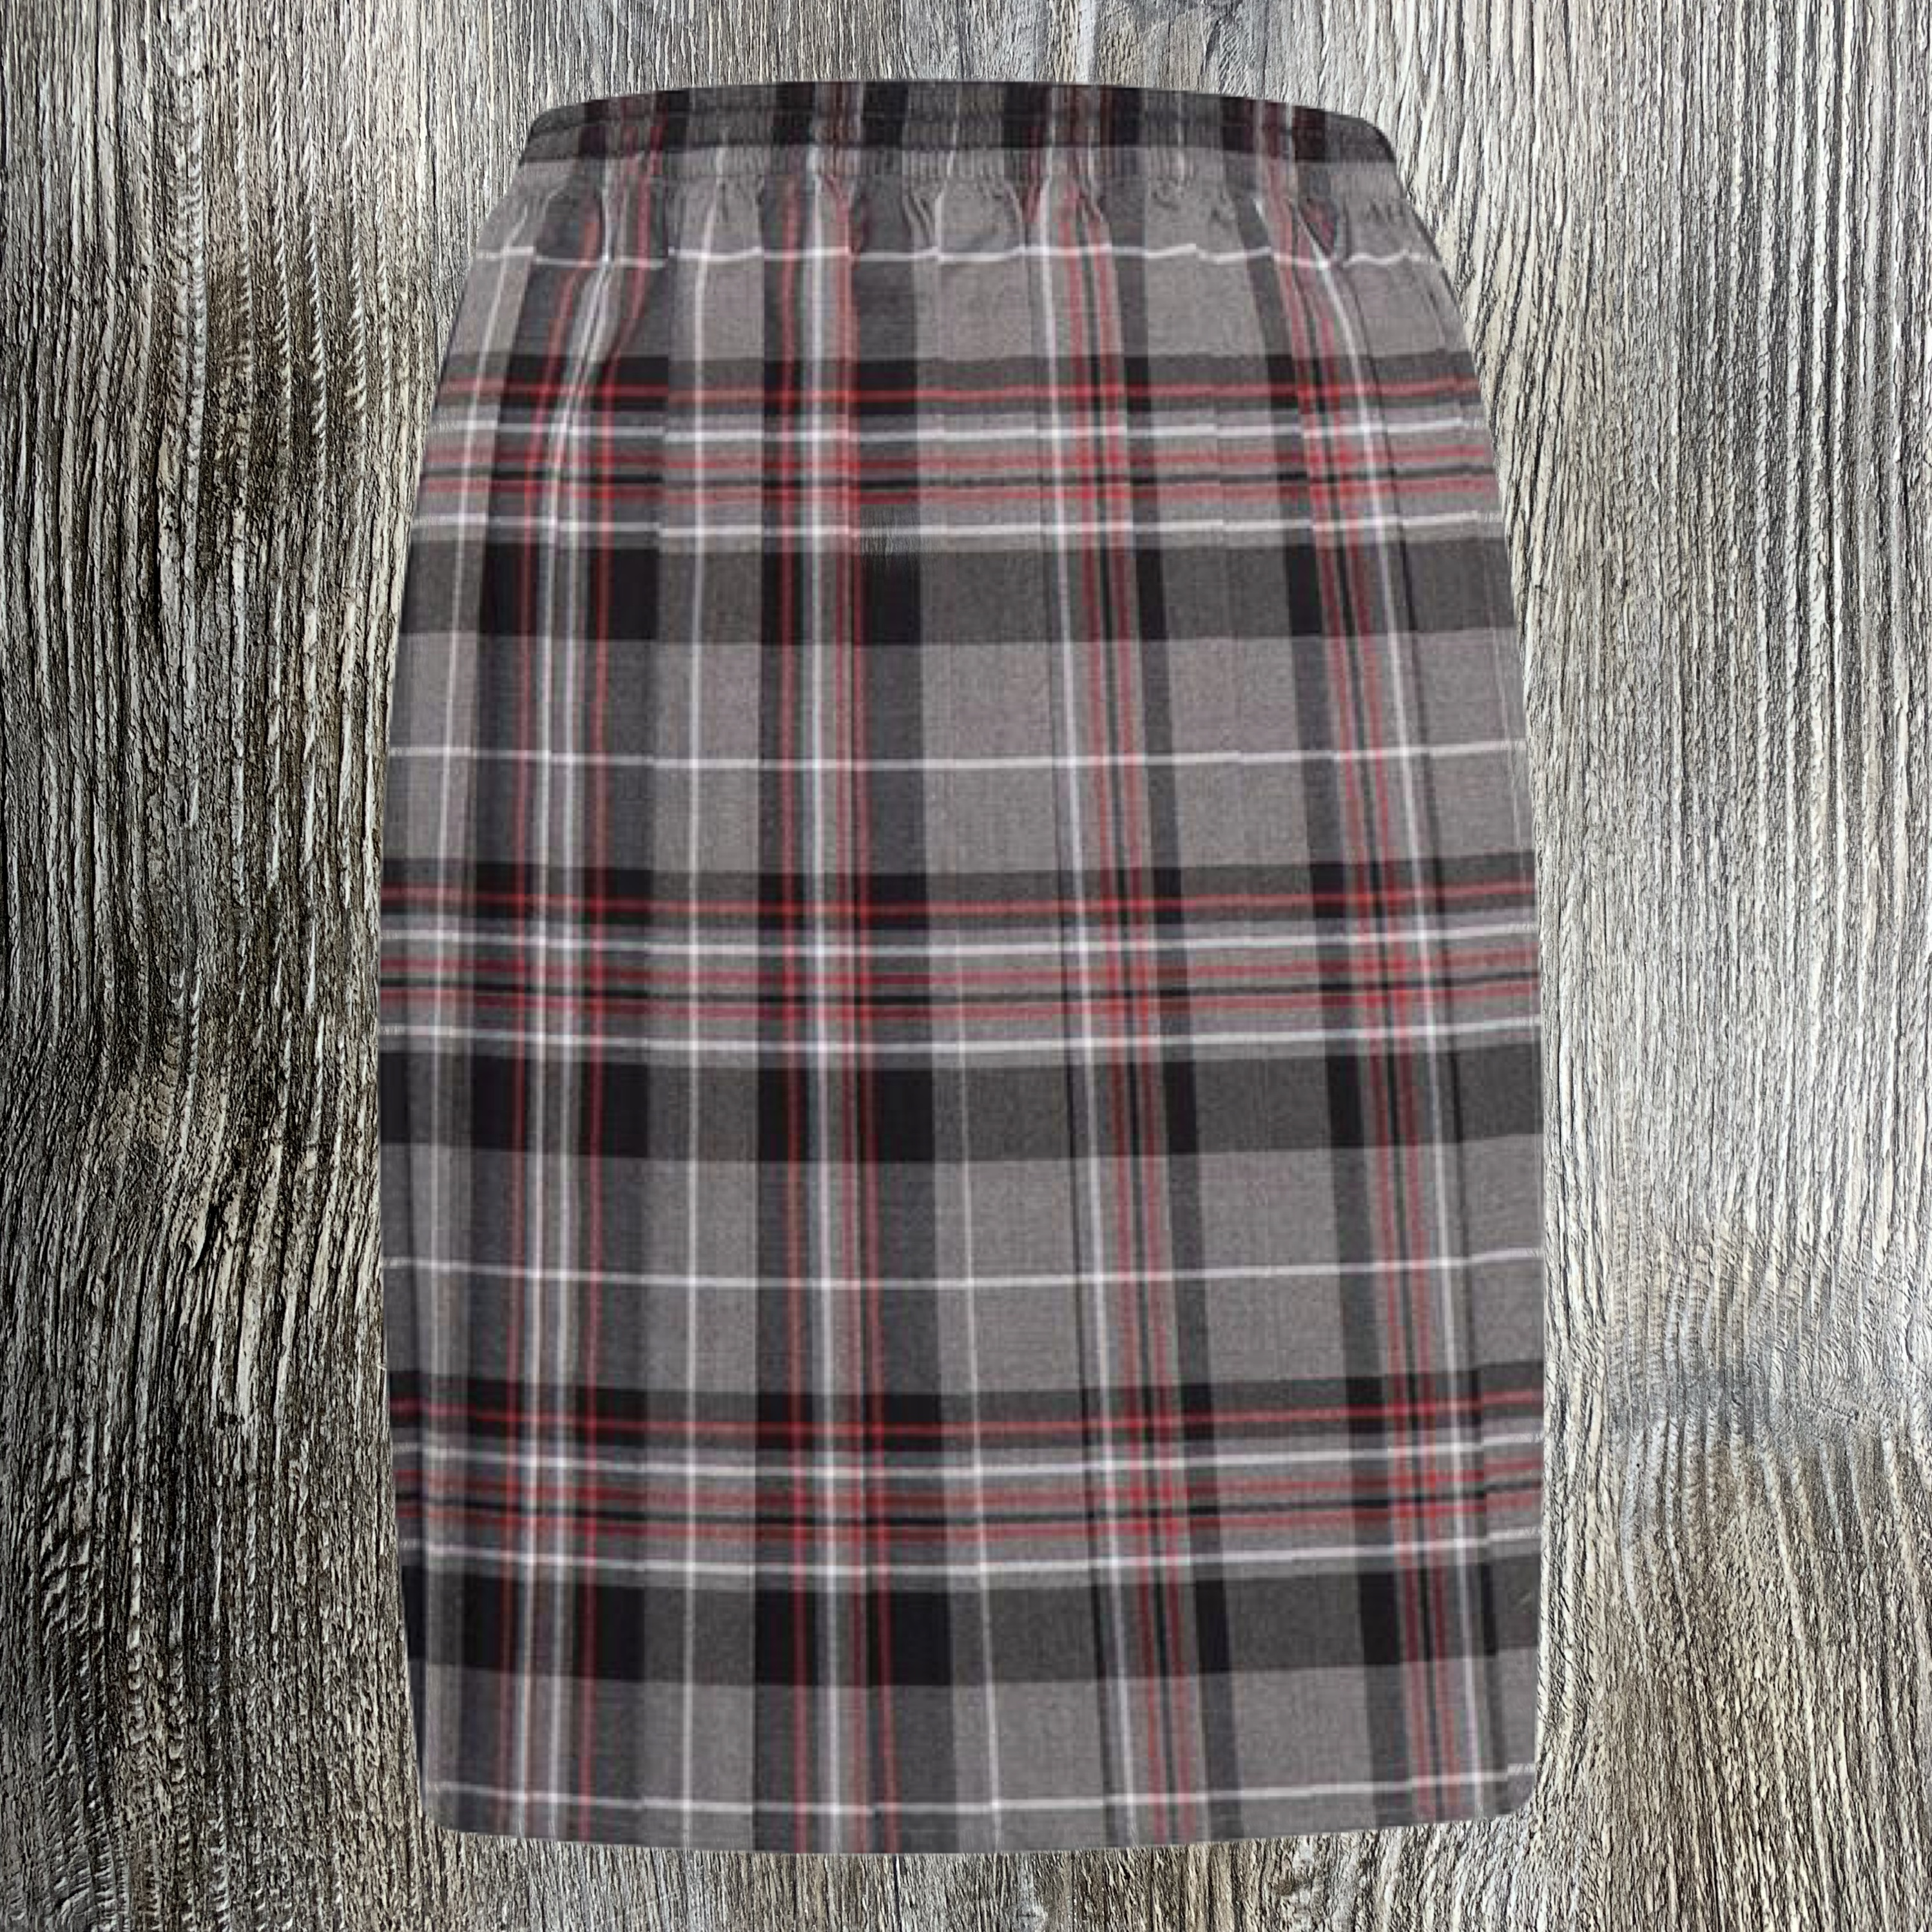 Grey and Red Tartan Skirt